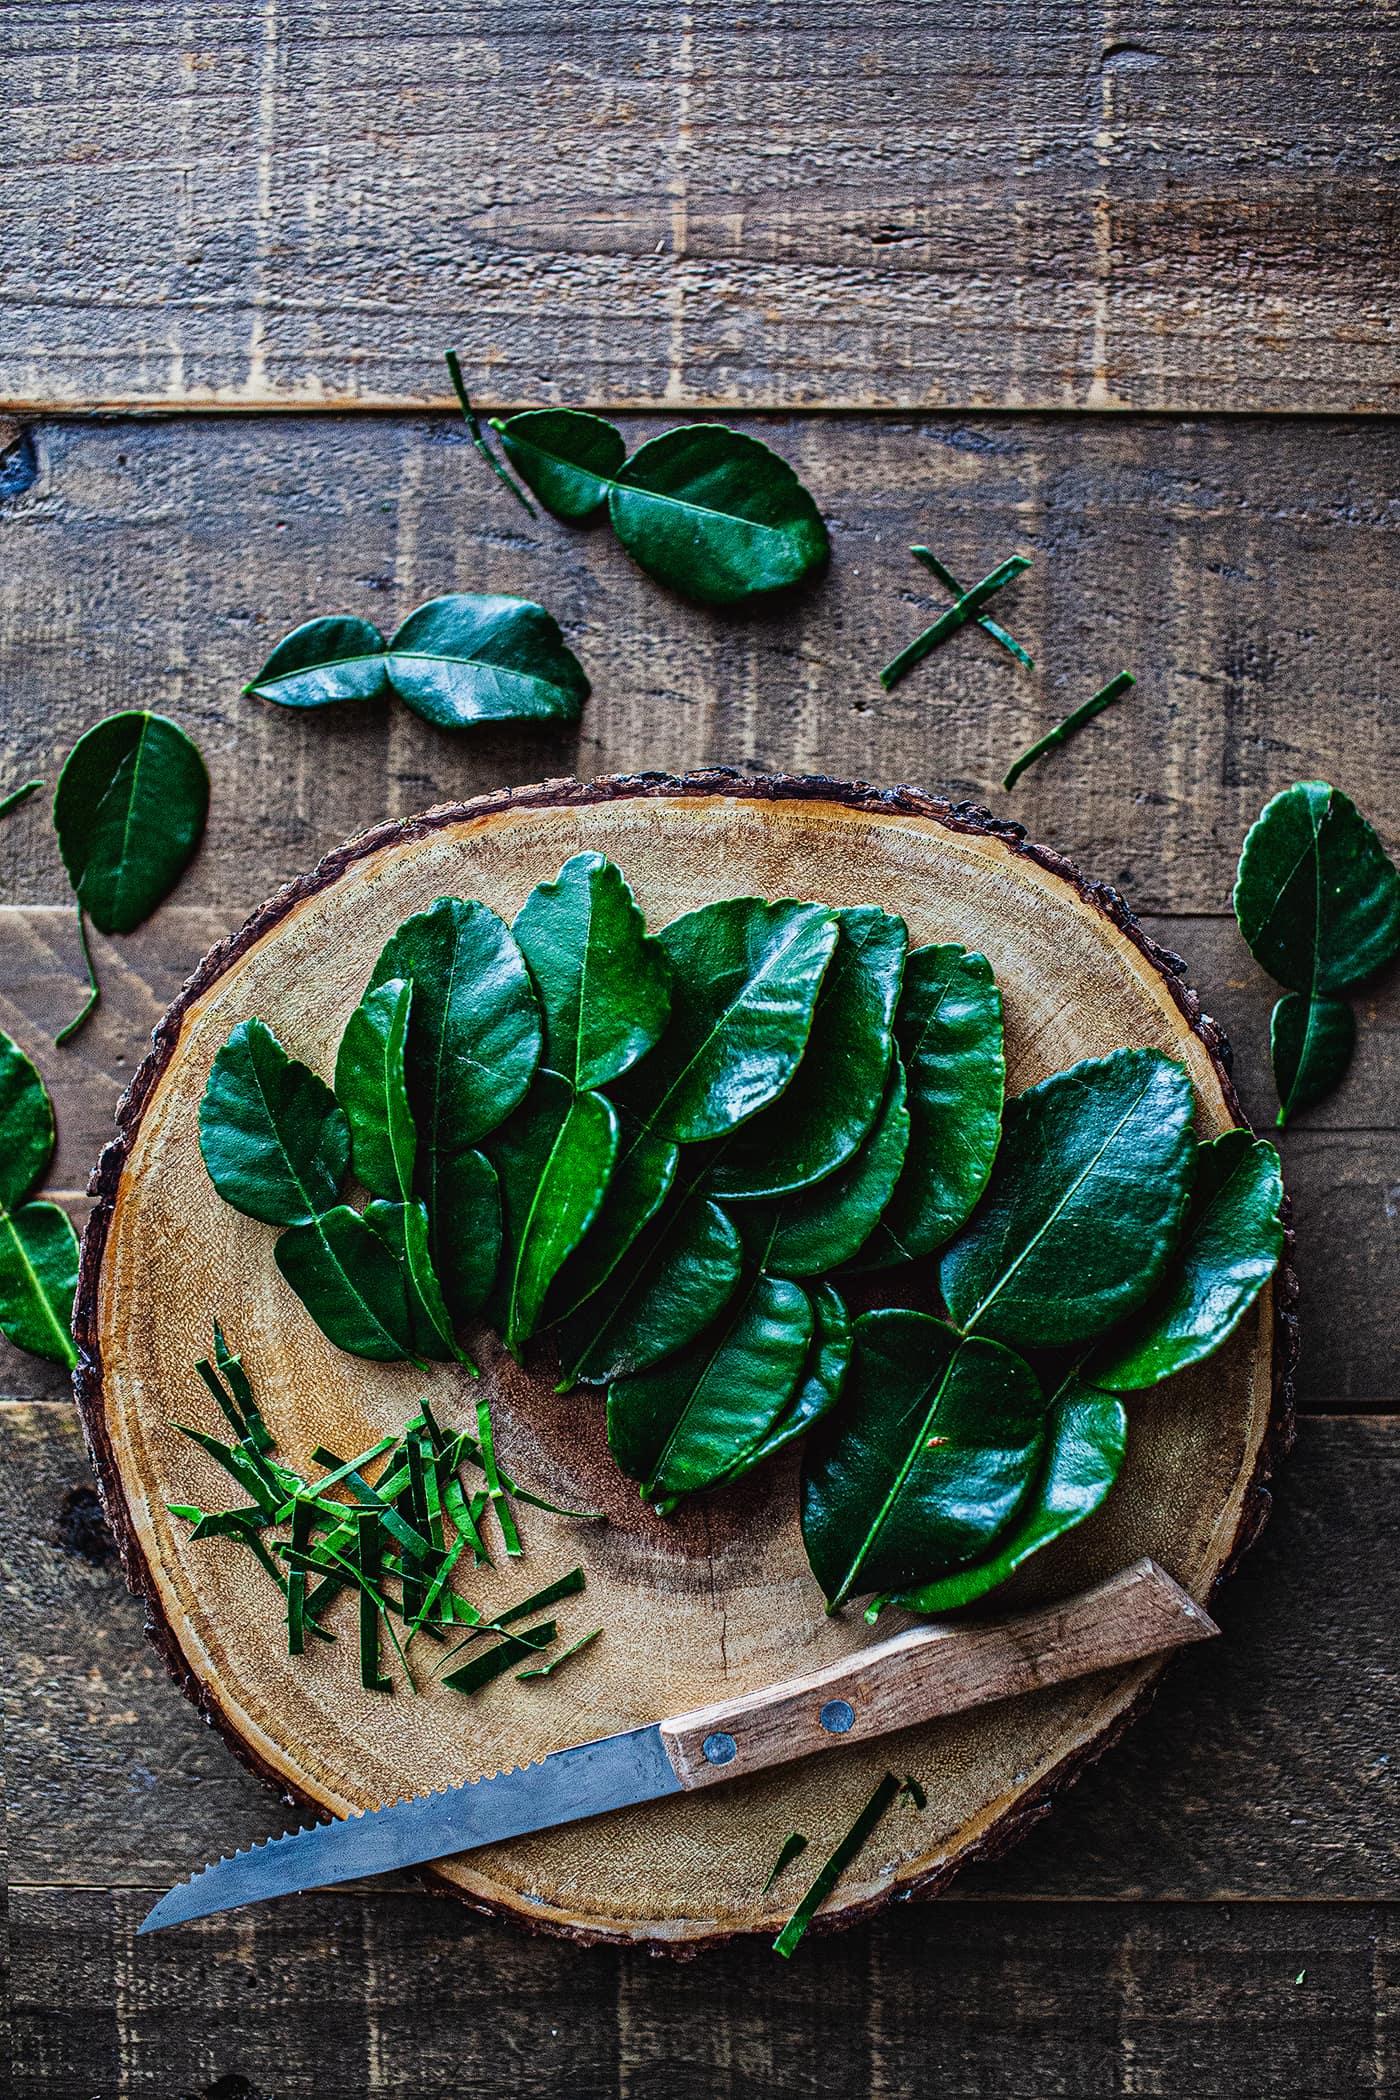 Markrut or Kaffir lime leaves